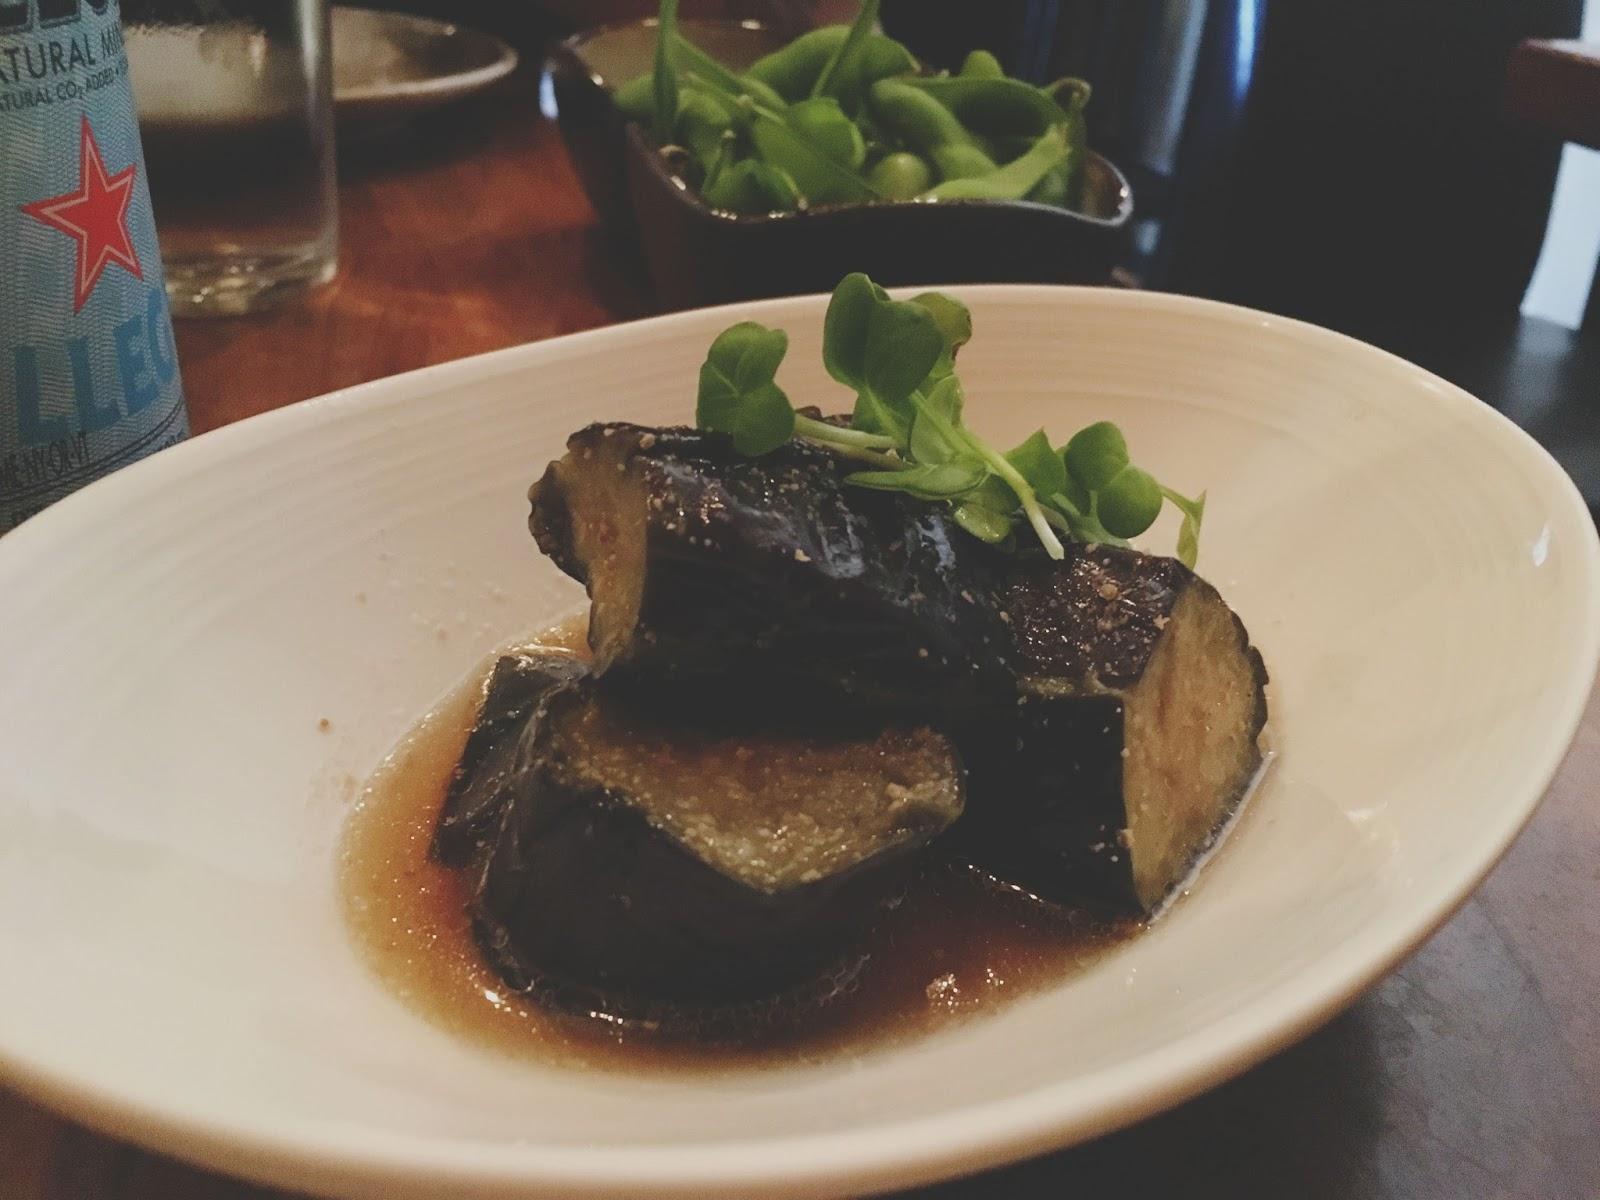 eggplant appetizer at Saru Sushi - a restaurant in San Francisco